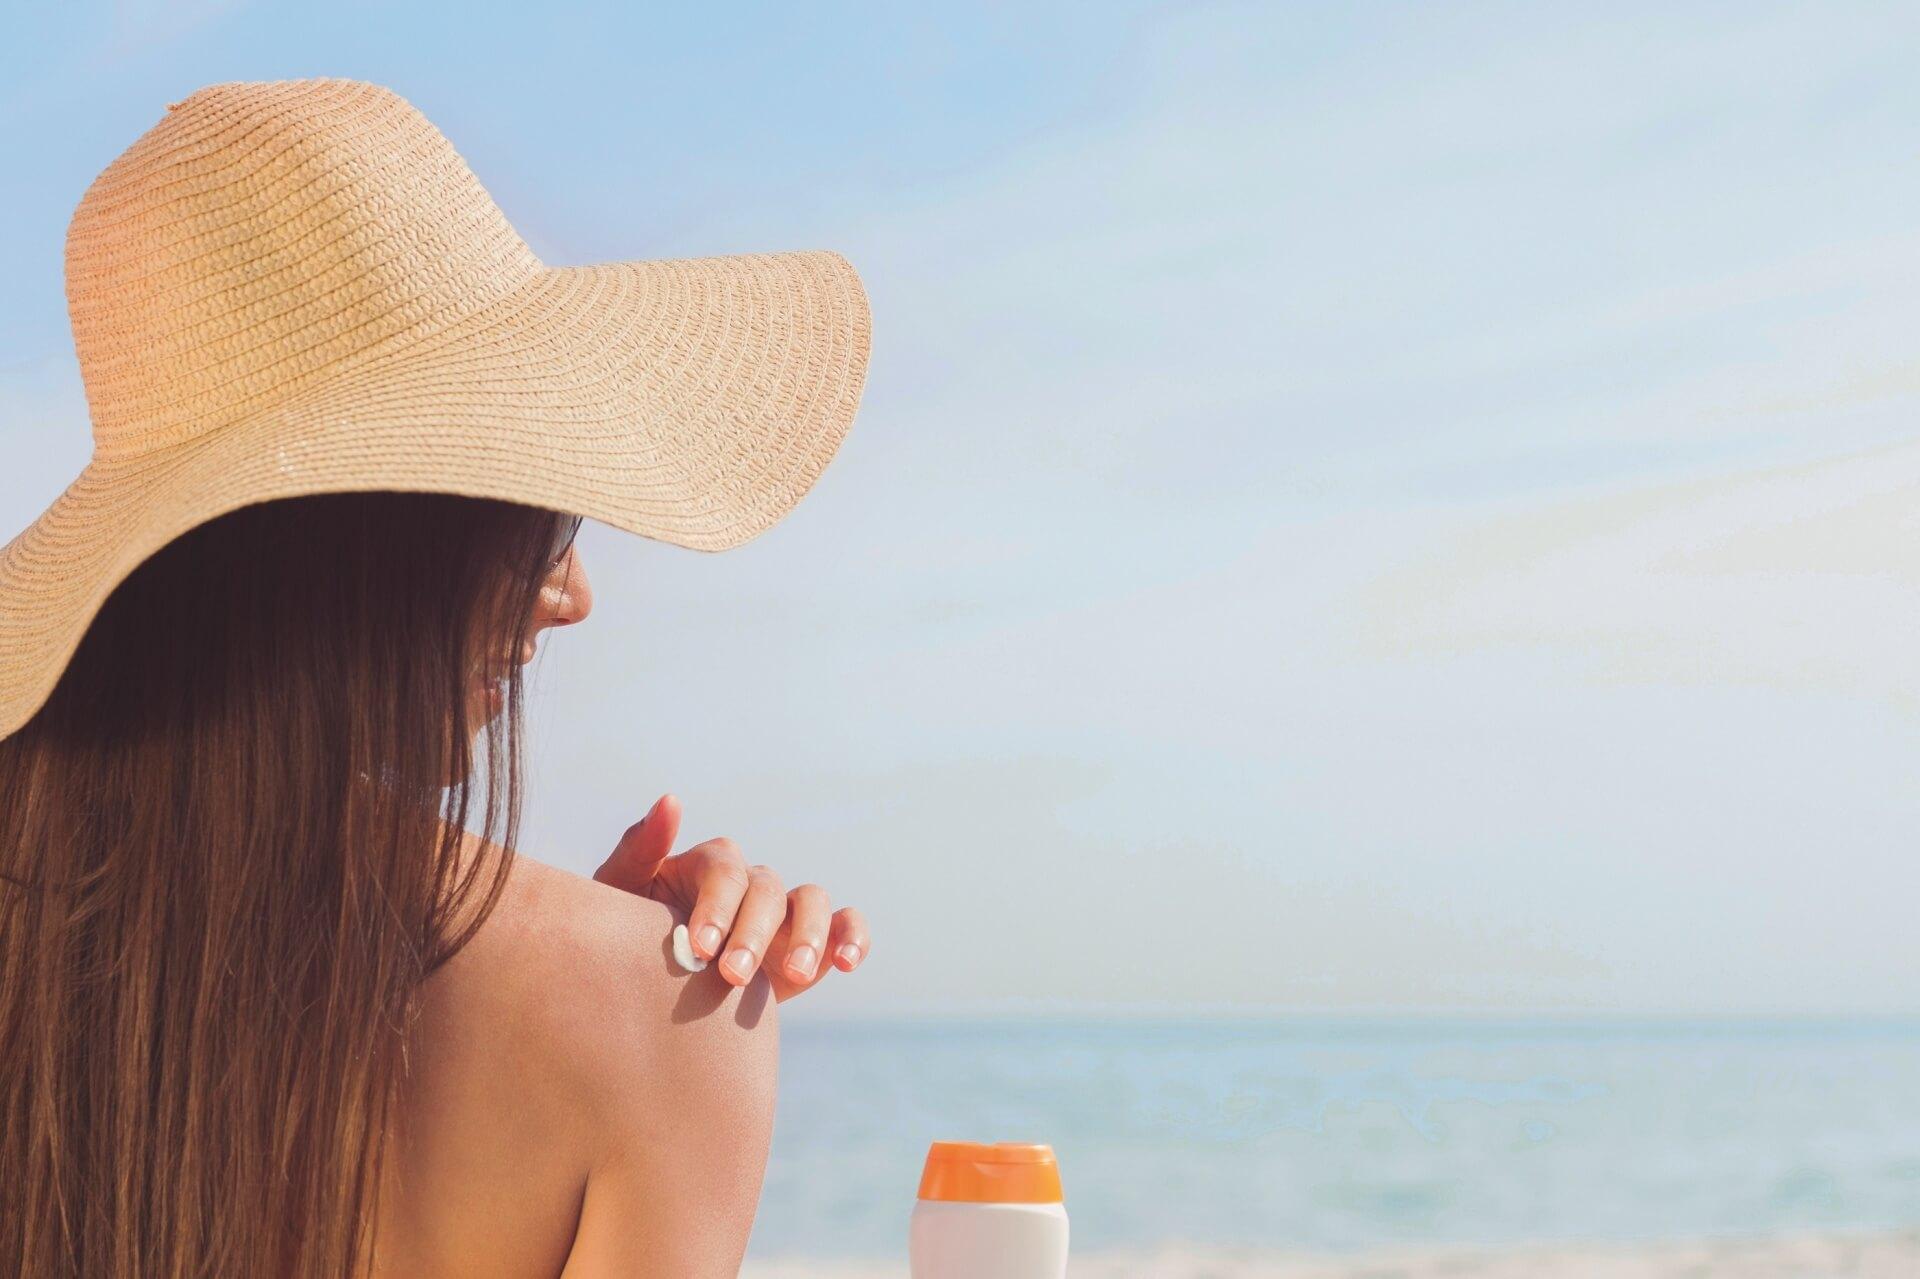 A woman applying sunblock